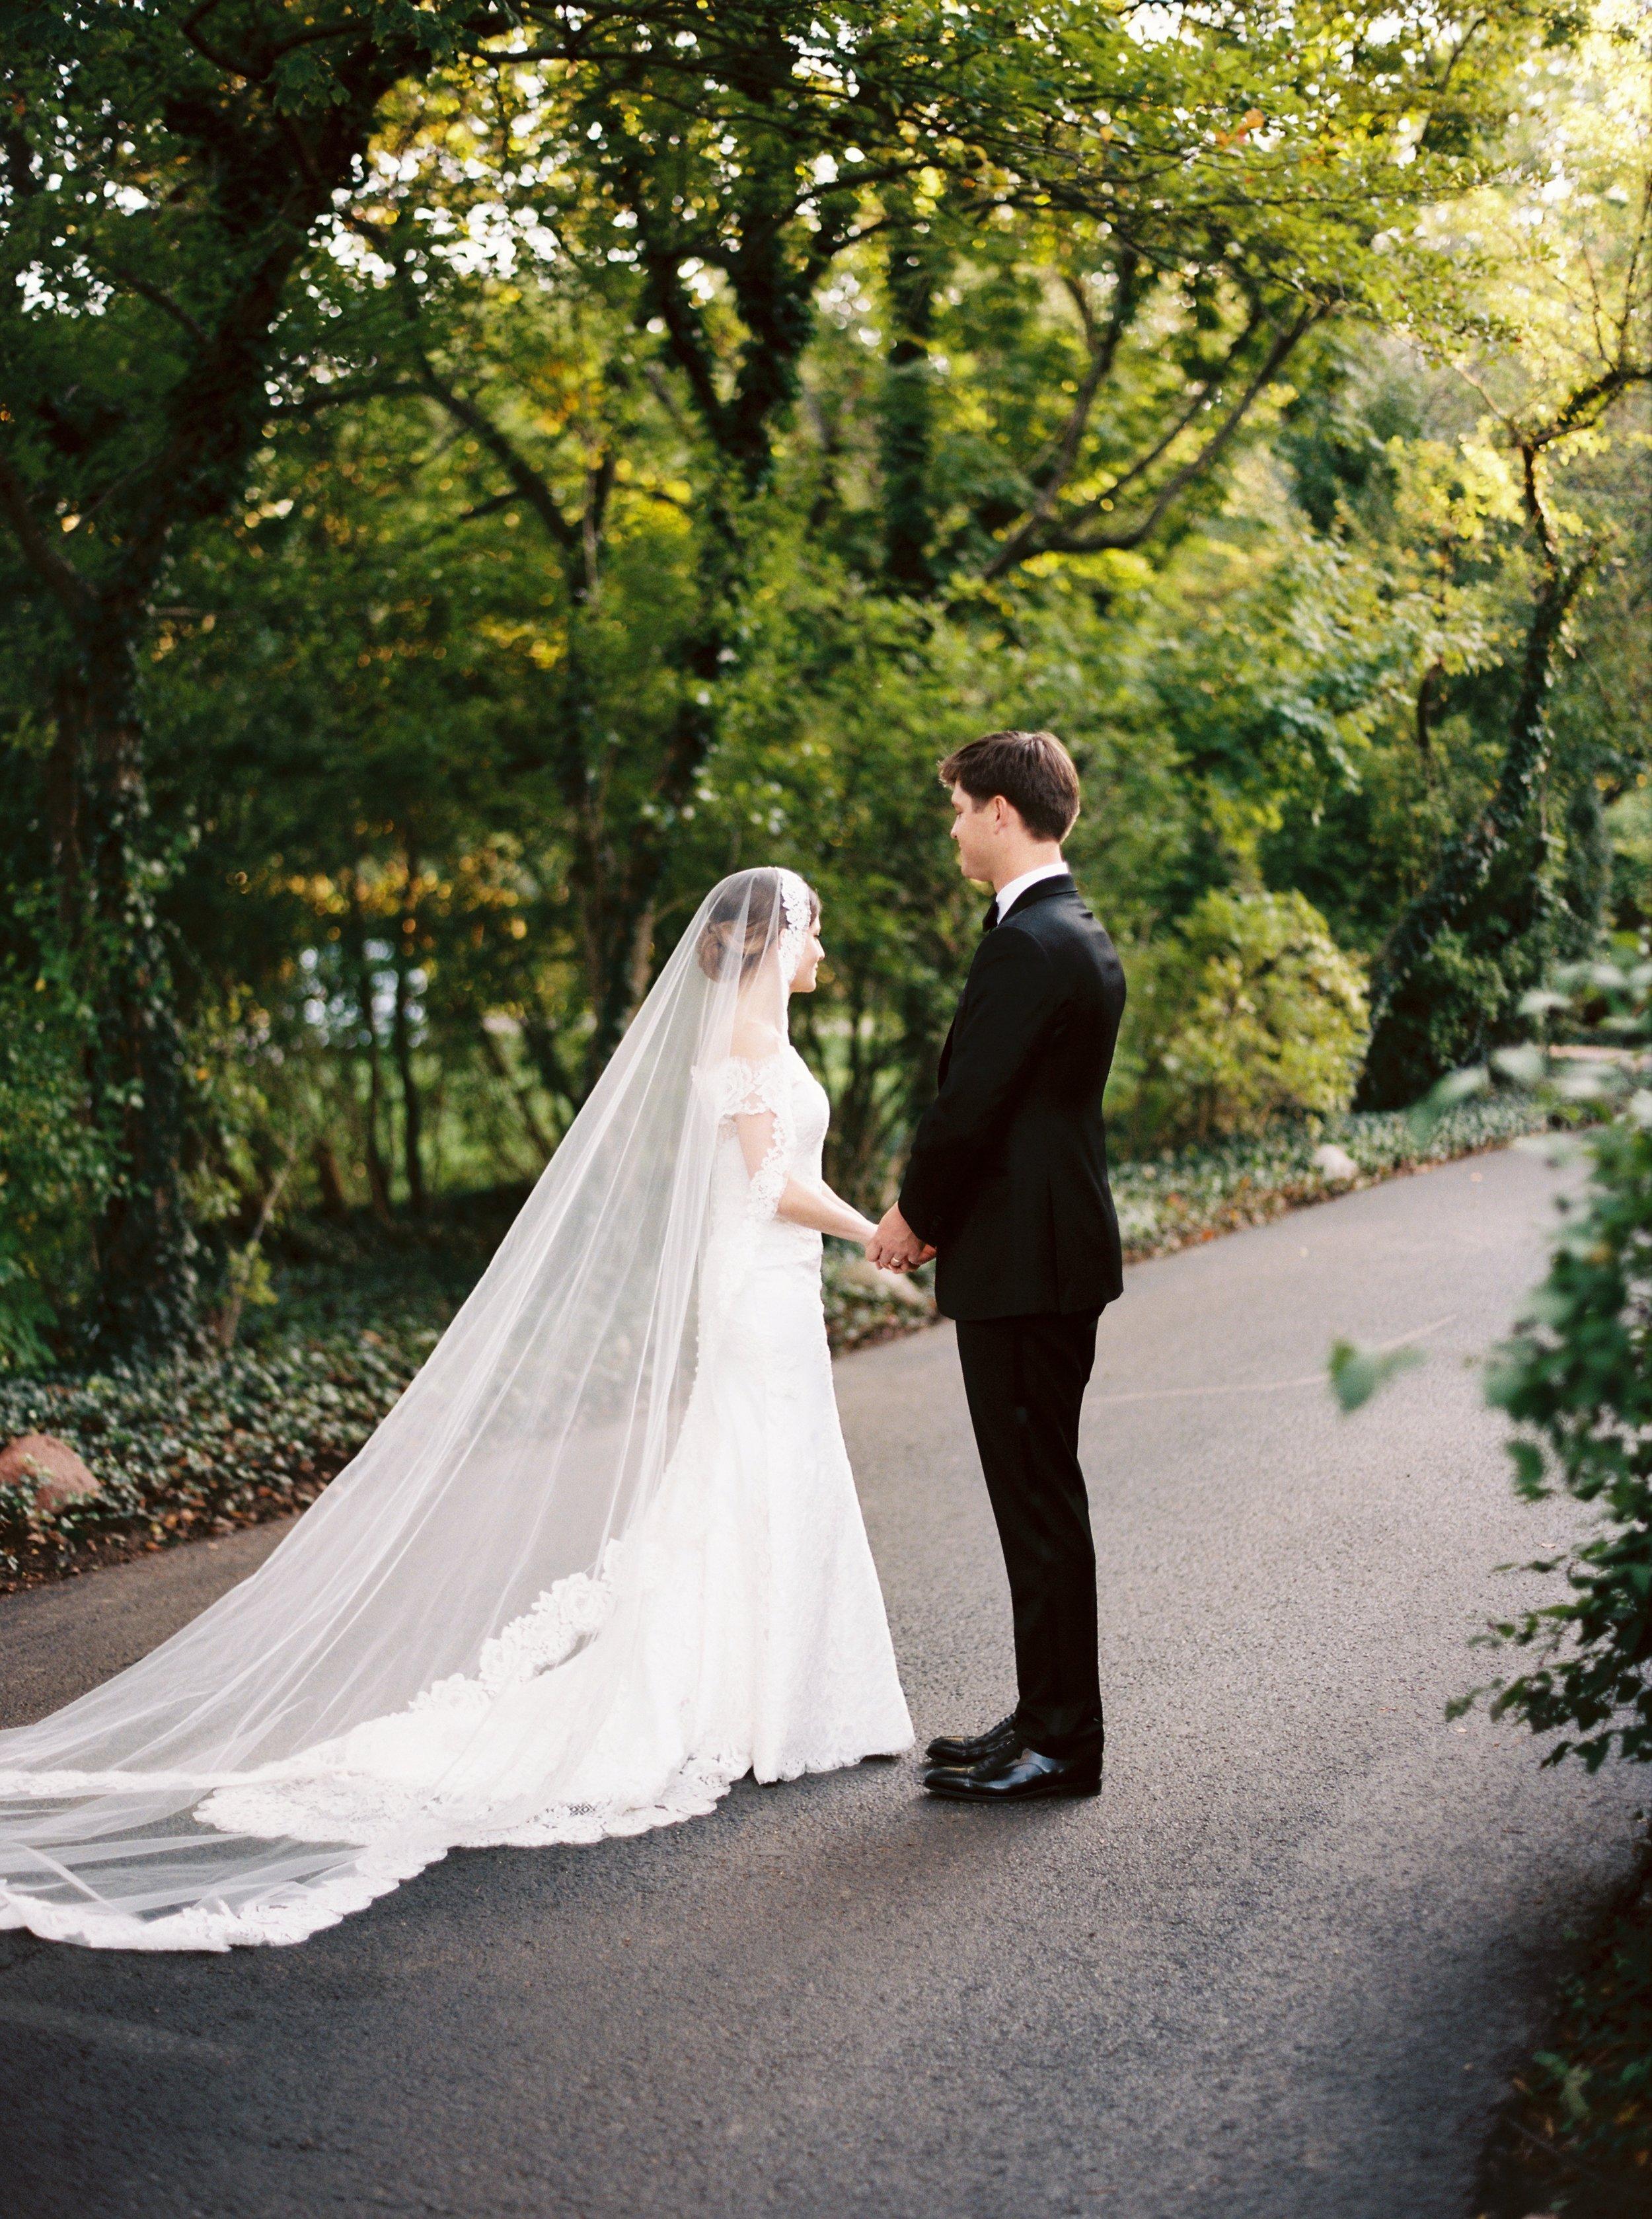 Kyle John l Fine Art Wedding Photography l Chicago, Copenhagen, California, New York, Destination l Blog l Connie & Connor_Winnetka_25